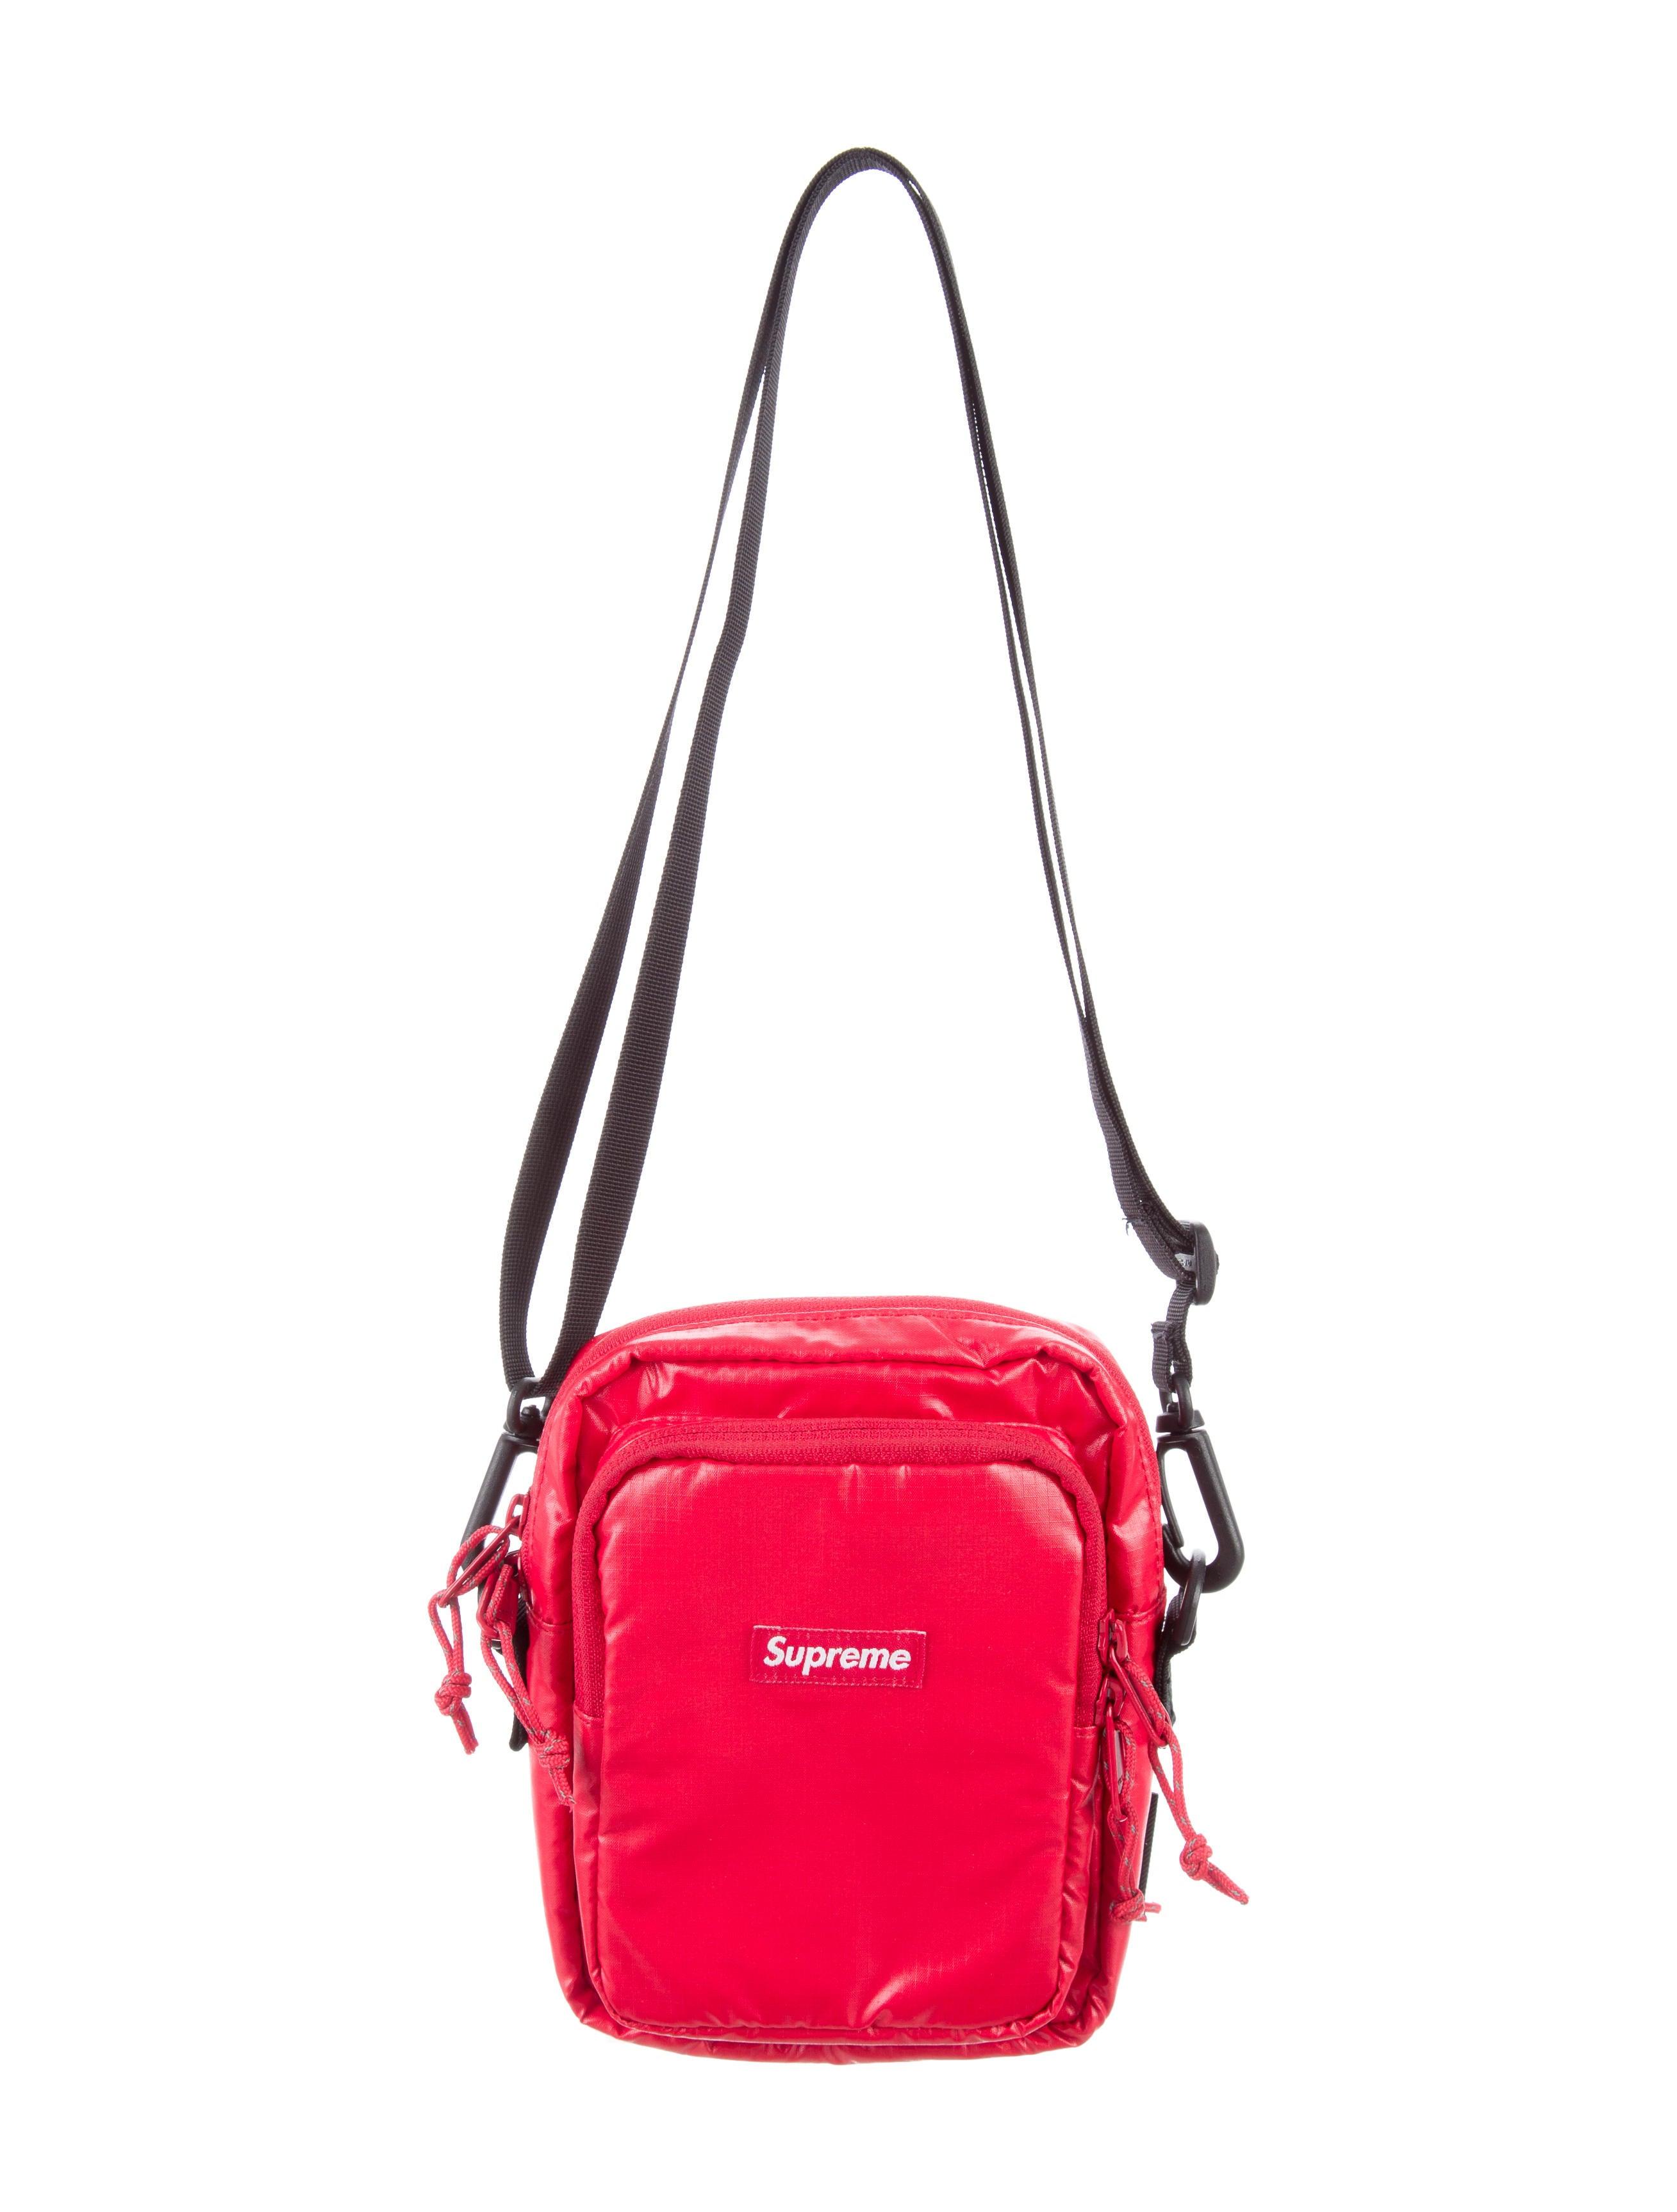 Supreme 2017 Box Logo Shoulder Bag Bags Wspme20475